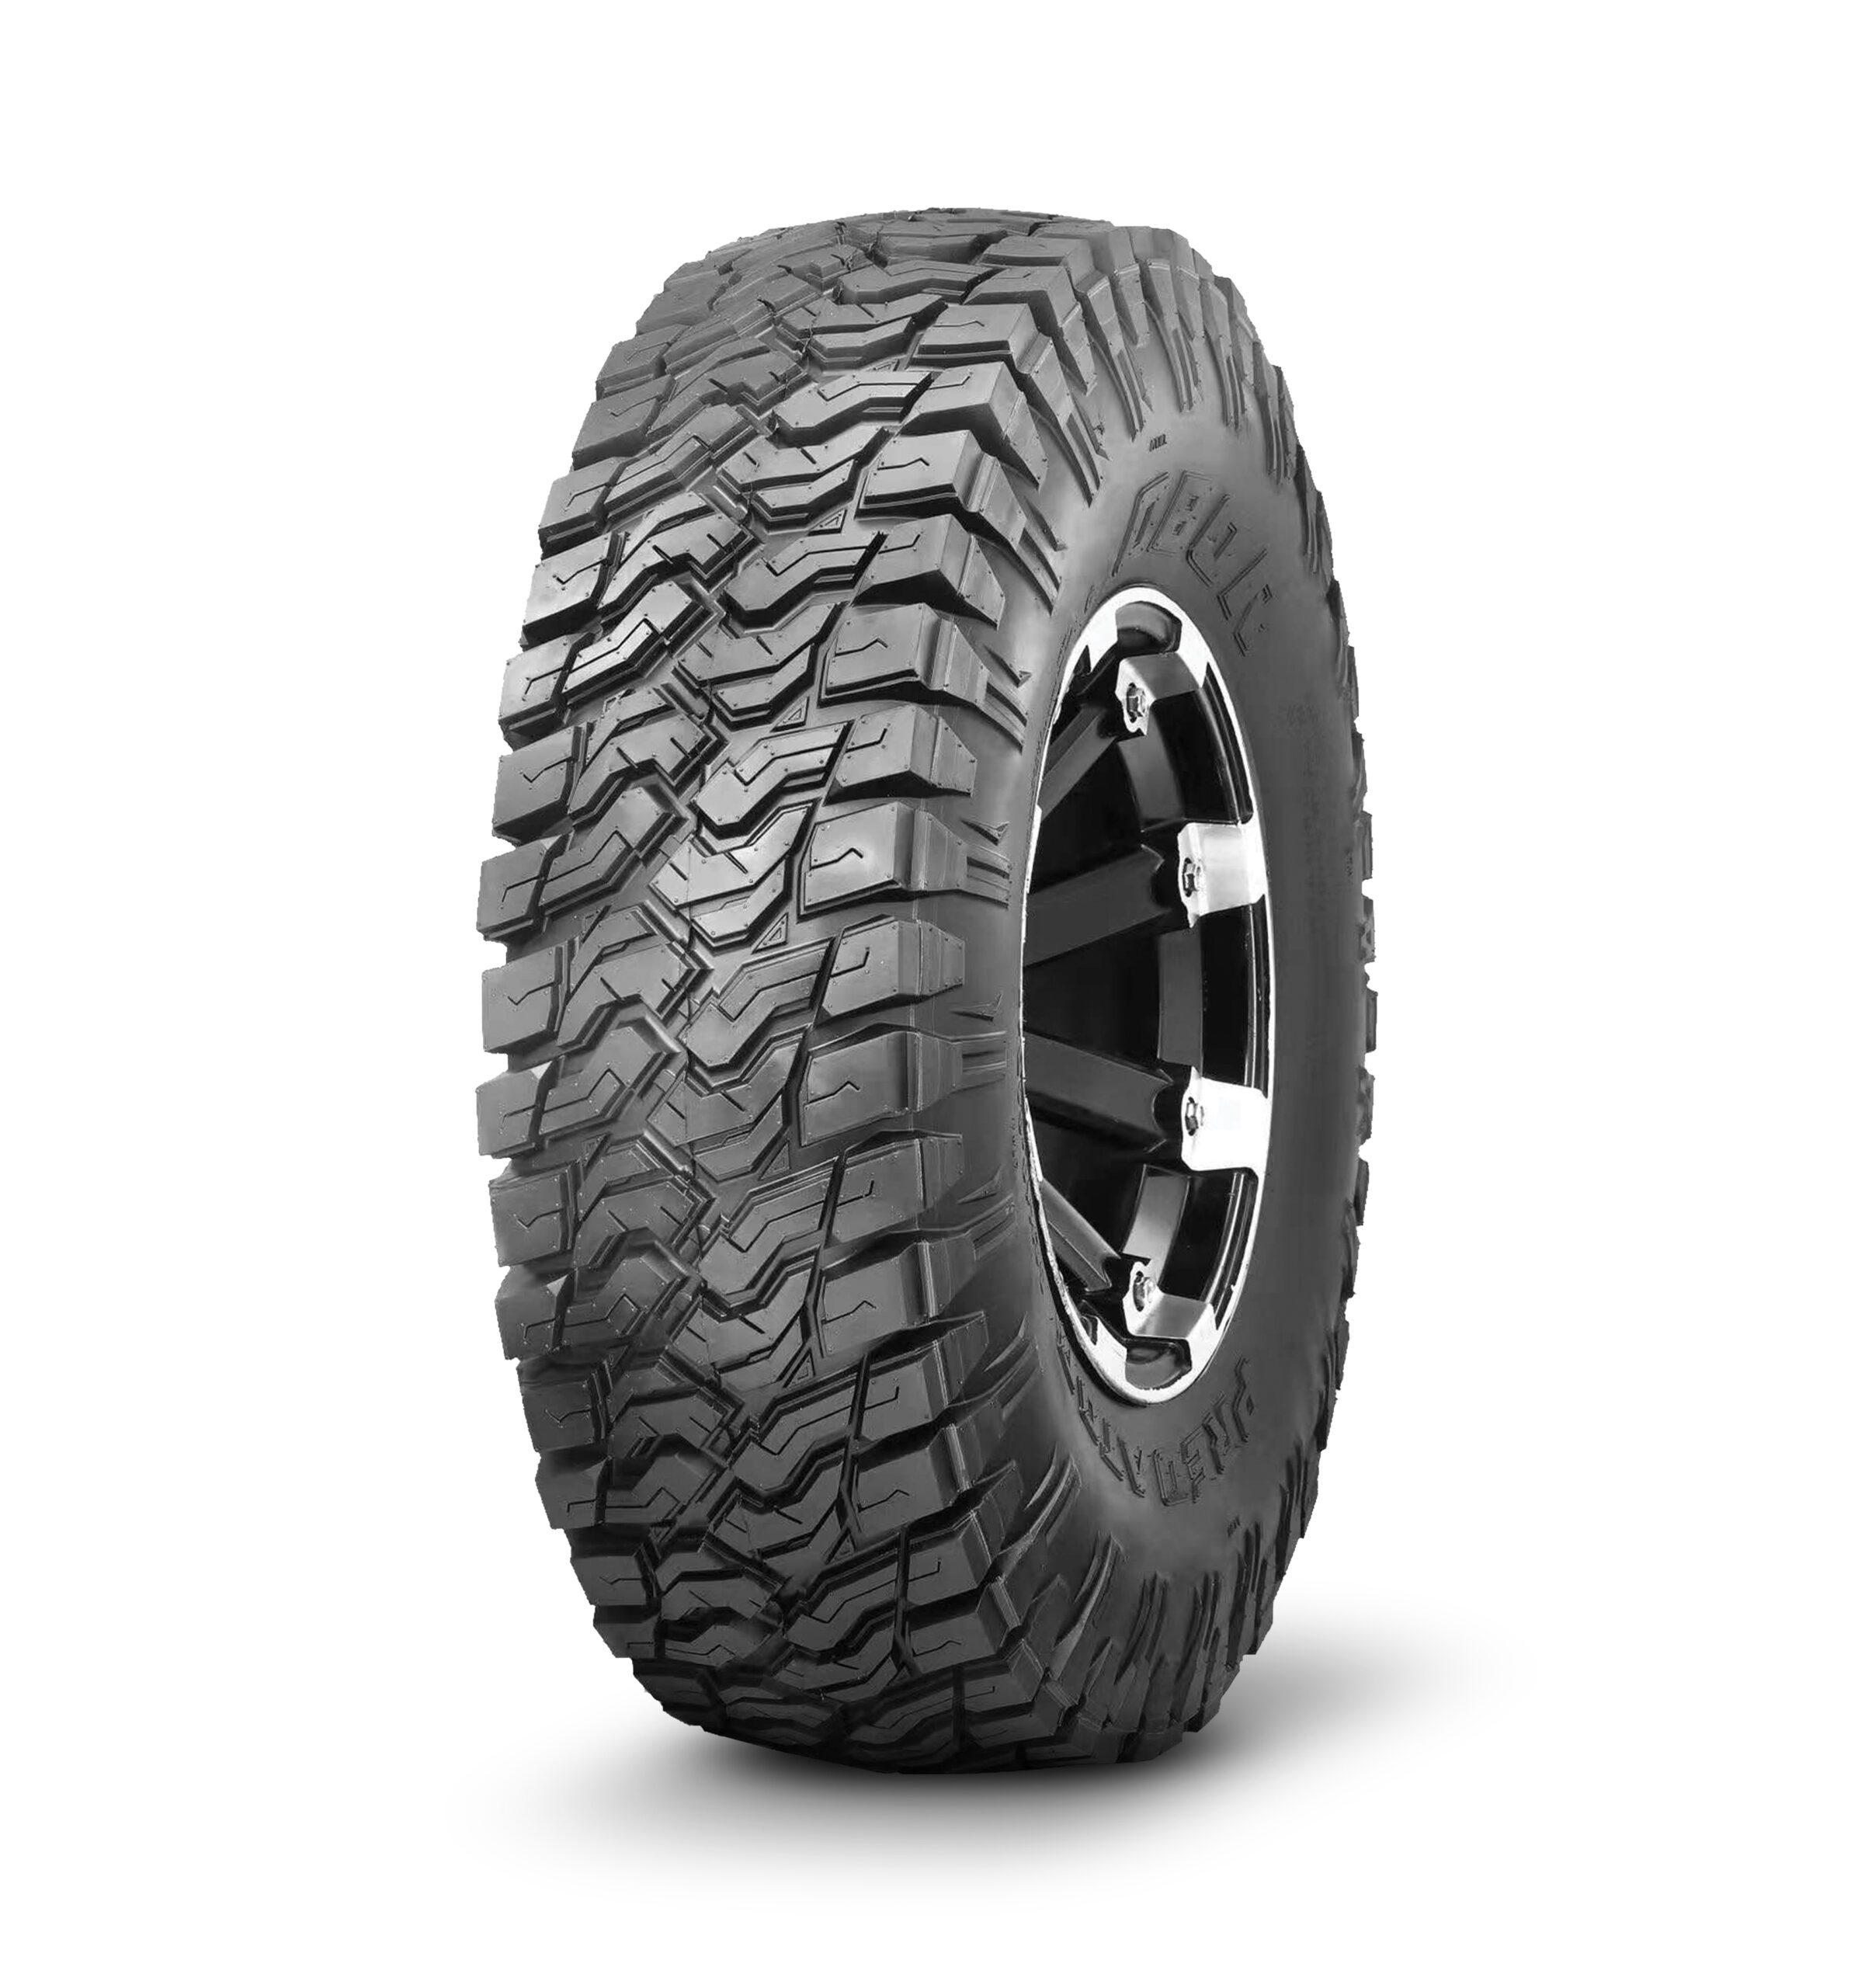 OBOR Tires introduces the Predator